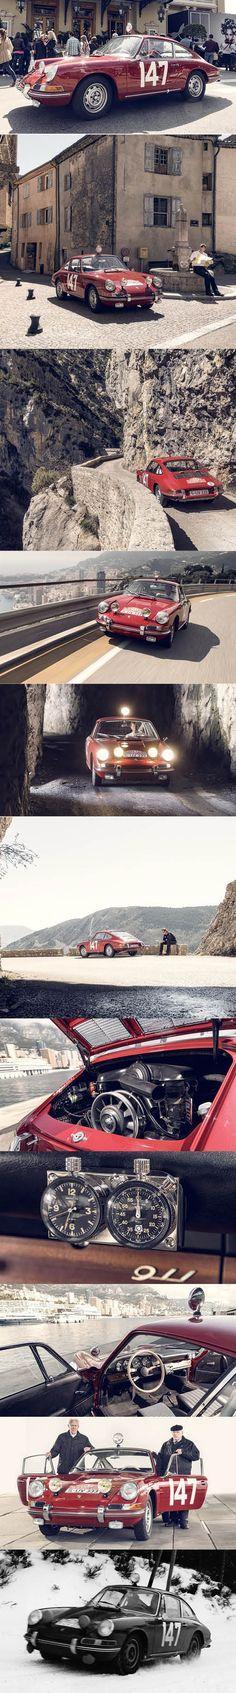 1965 Porsche 911 S / Germany / winner Rally Monte Carlo / red / restored by Porsche Classic